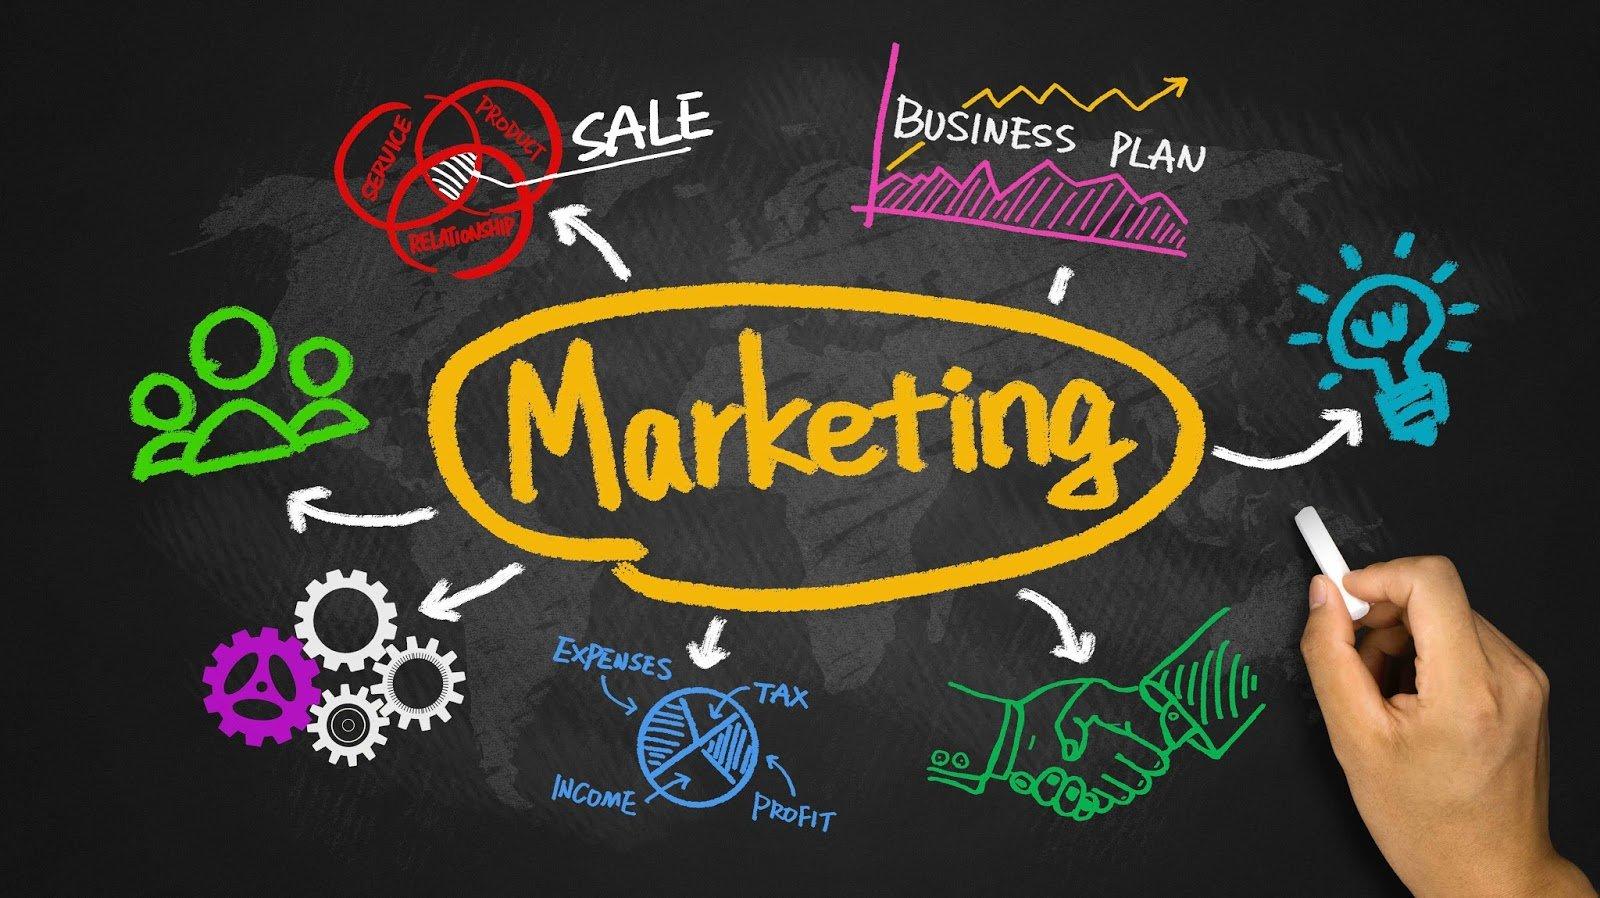 about IT marketing